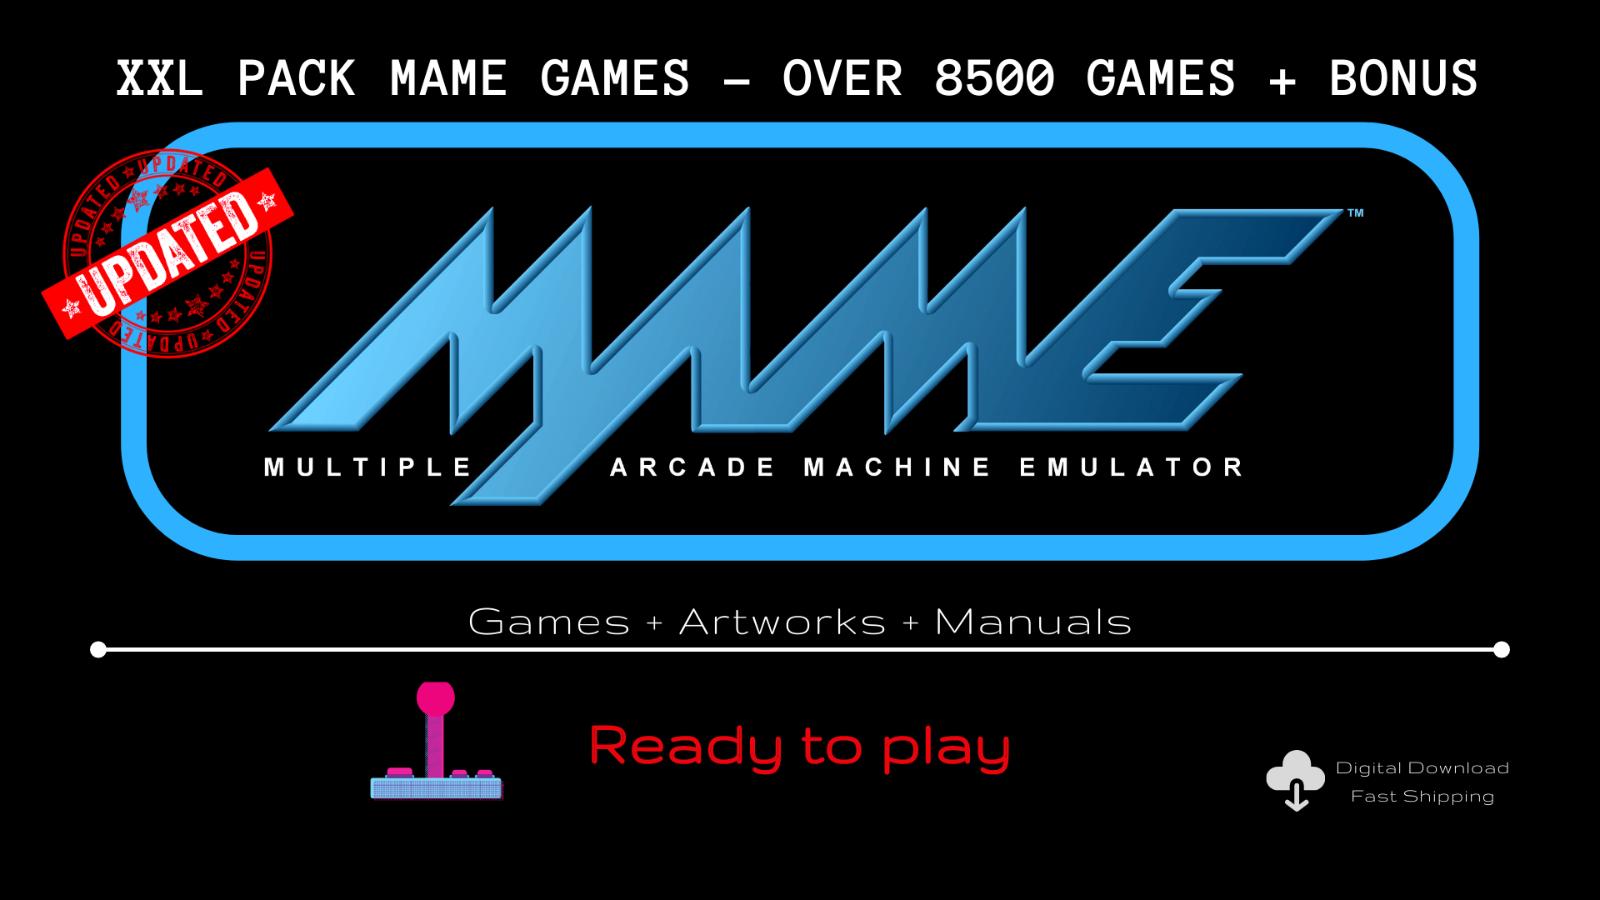 MAME XXL PACK - 8500+ Games + Artworks + Manuals - ARCADE, VINTAGE, ROMs DDW